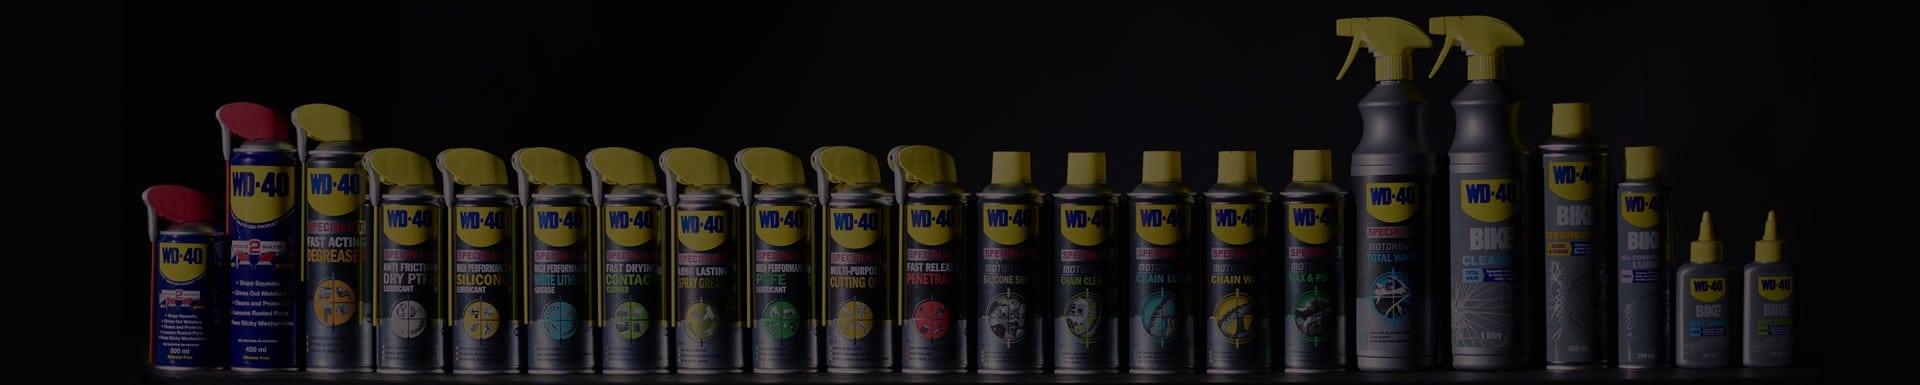 wd 40 product range banner